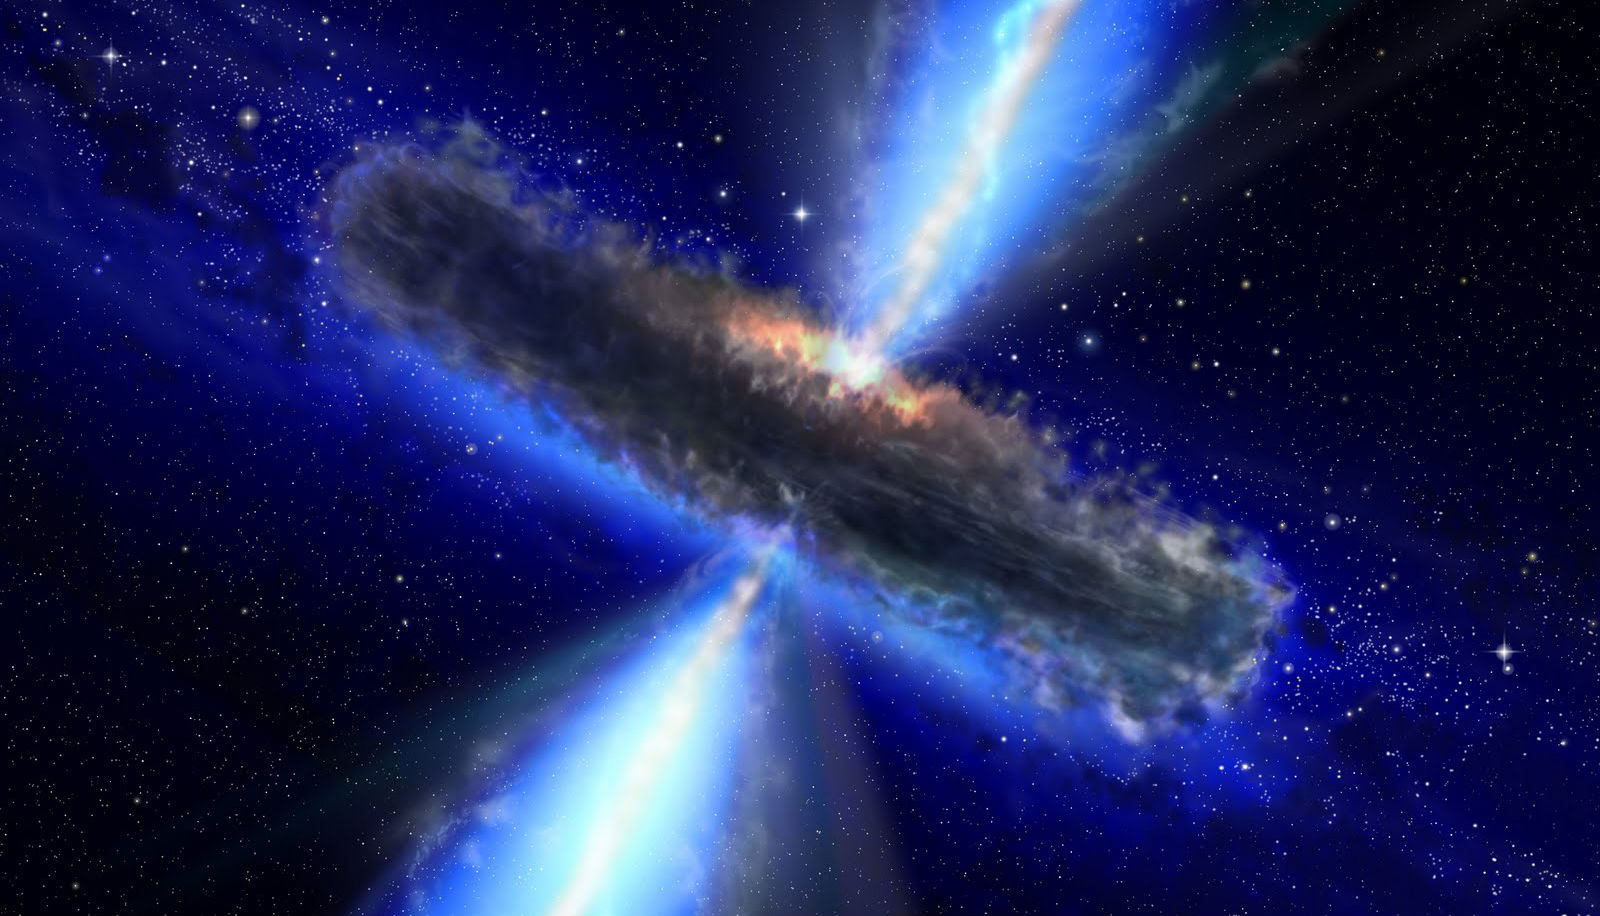 Un Mapa De Materia Oscura En El Universo Omicrono